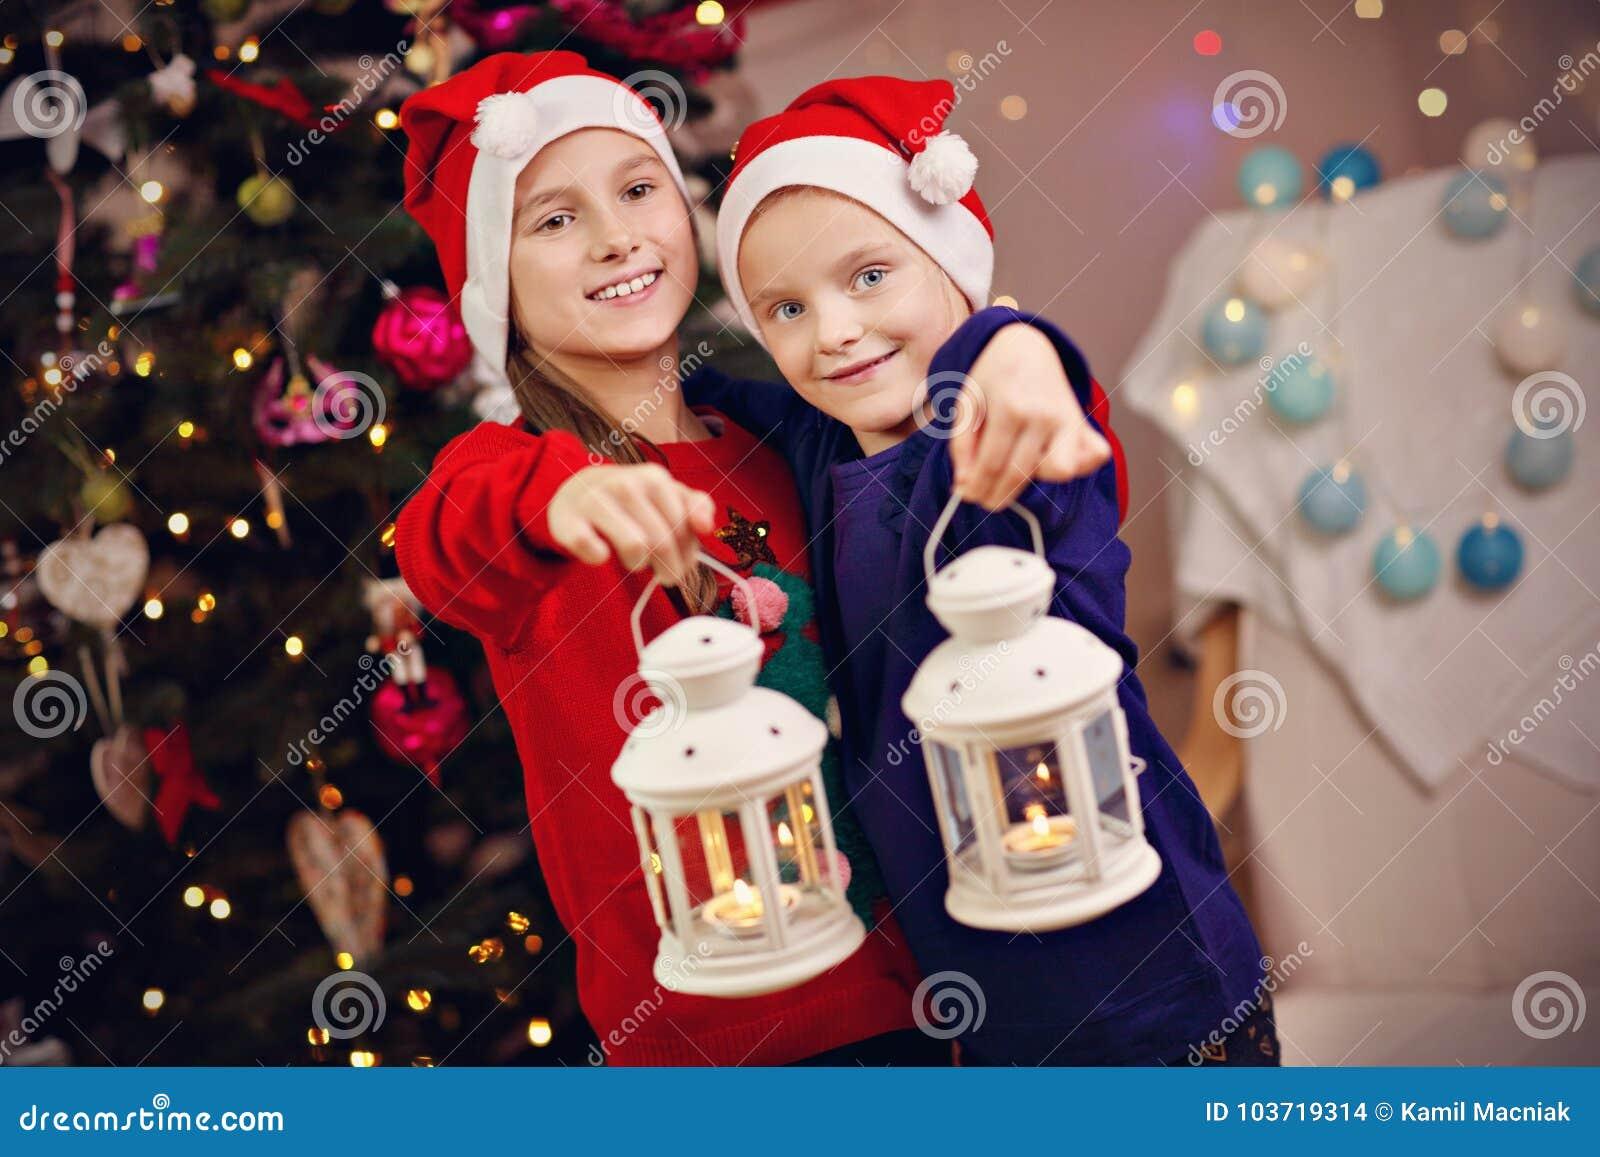 Christmas Lanterns.Happy Children Posing With Christmas Lanterns Stock Photo